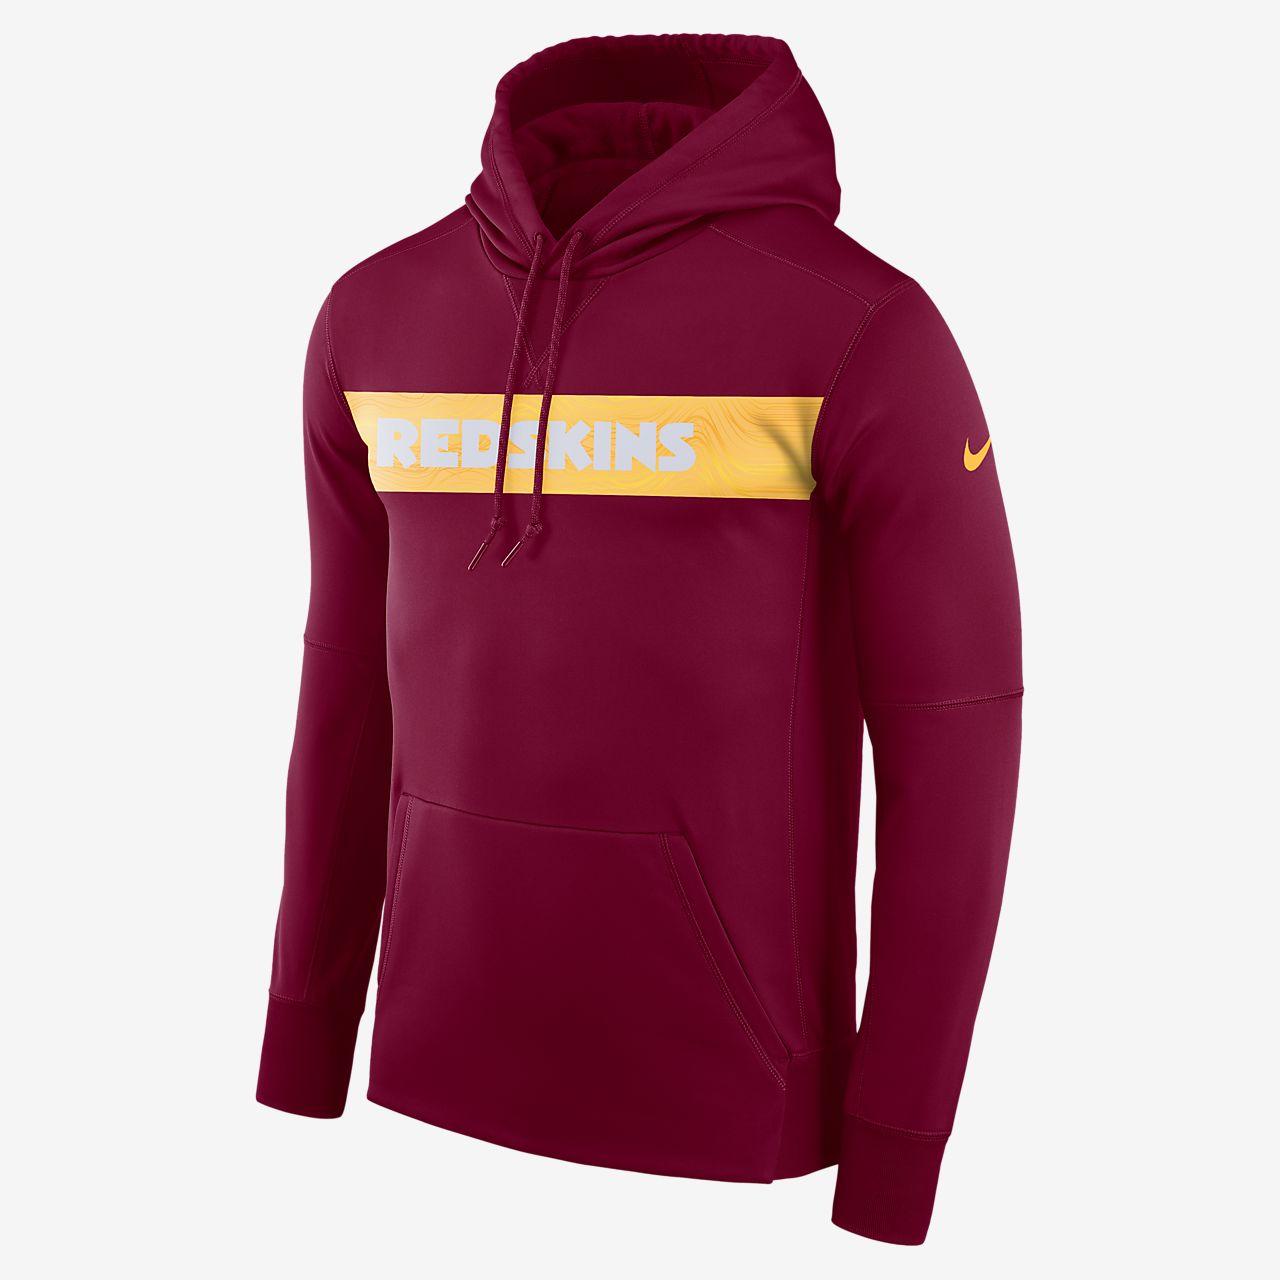 Sudadera con capucha sin cierre para hombre Nike Dri-FIT Therma (NFL  Redskins) 8c0d5a0f68dfb